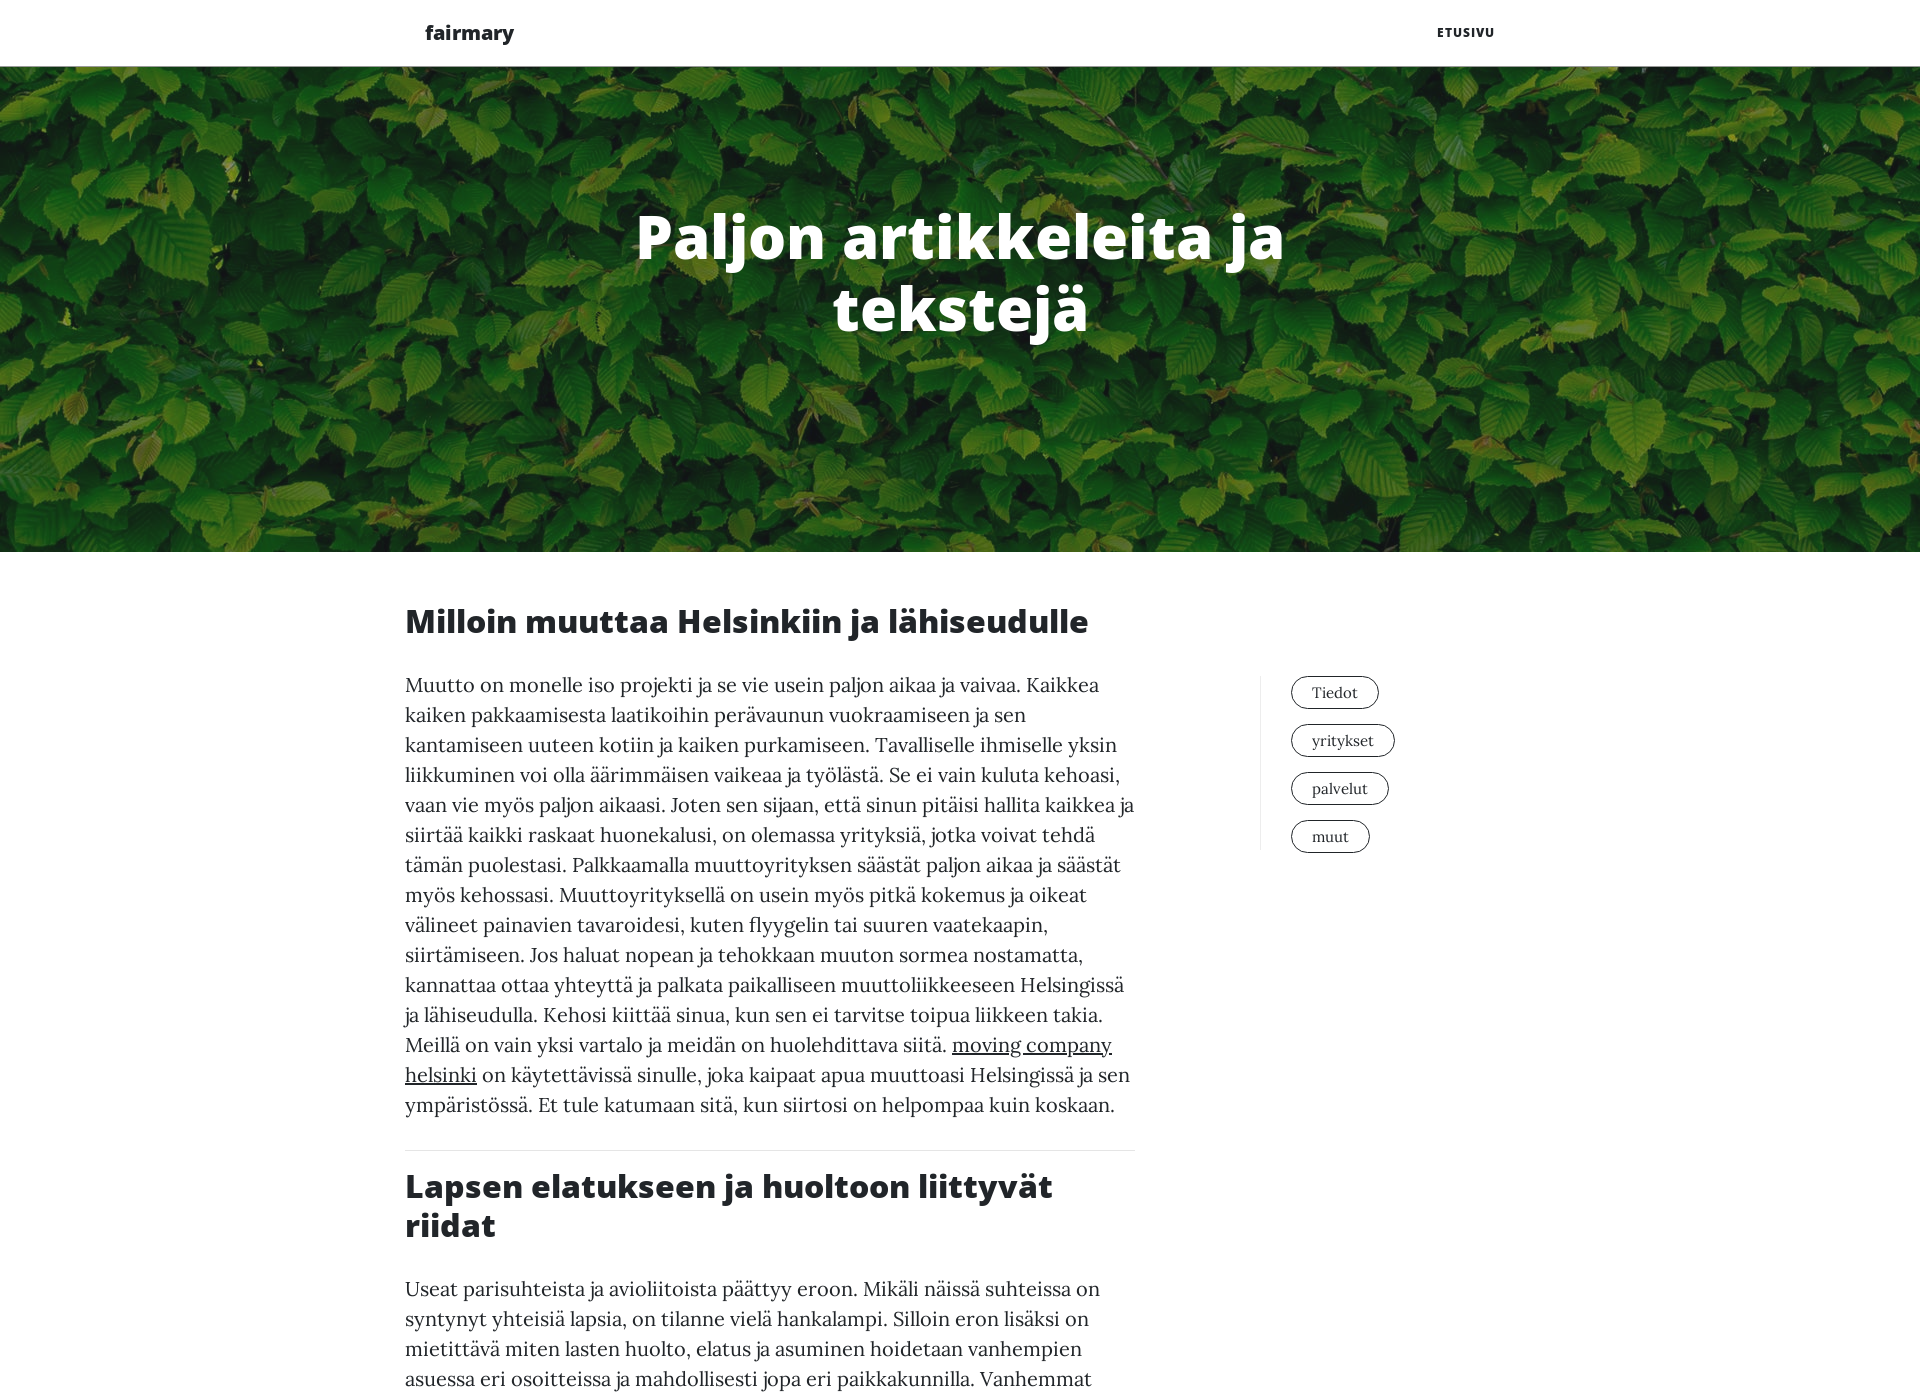 Screenshot for fairmary.fi